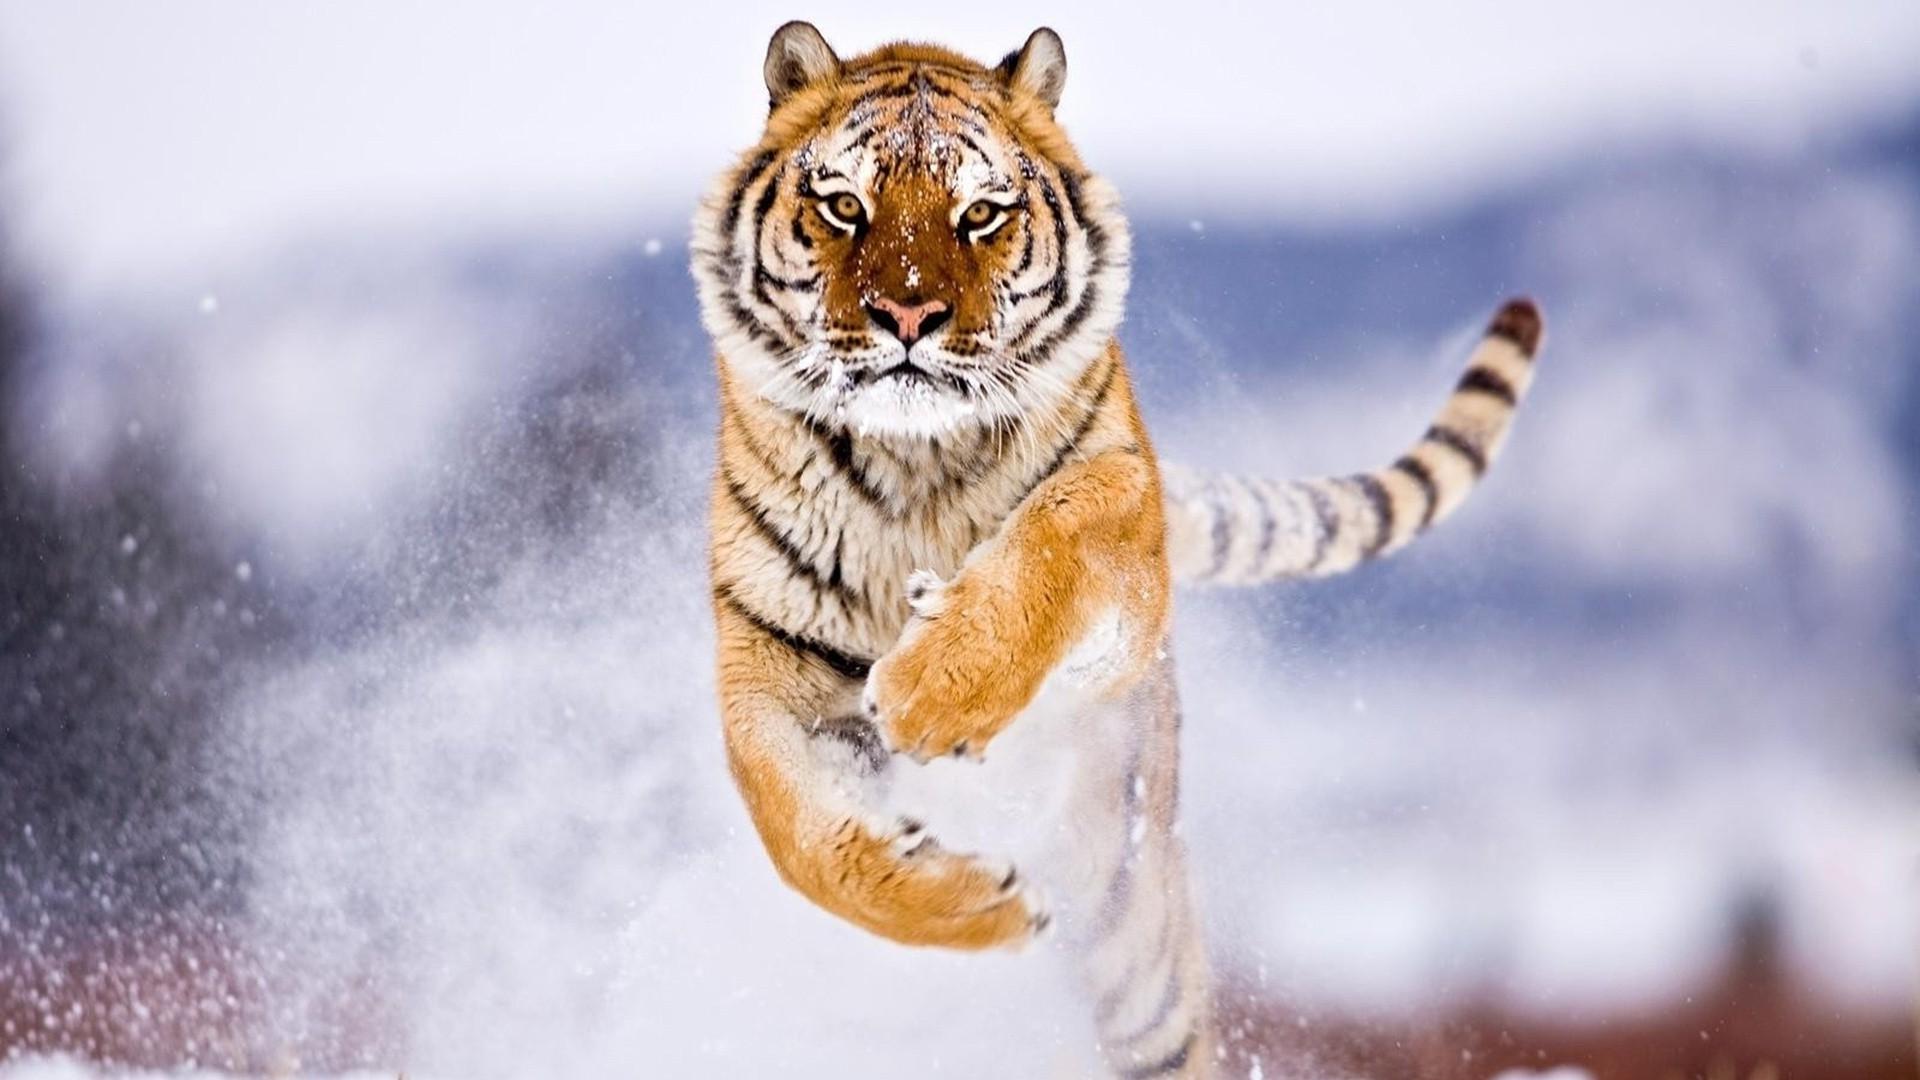 Wallpaper 1920x1080 Px Animals Attack Snow Tiger 1920x1080